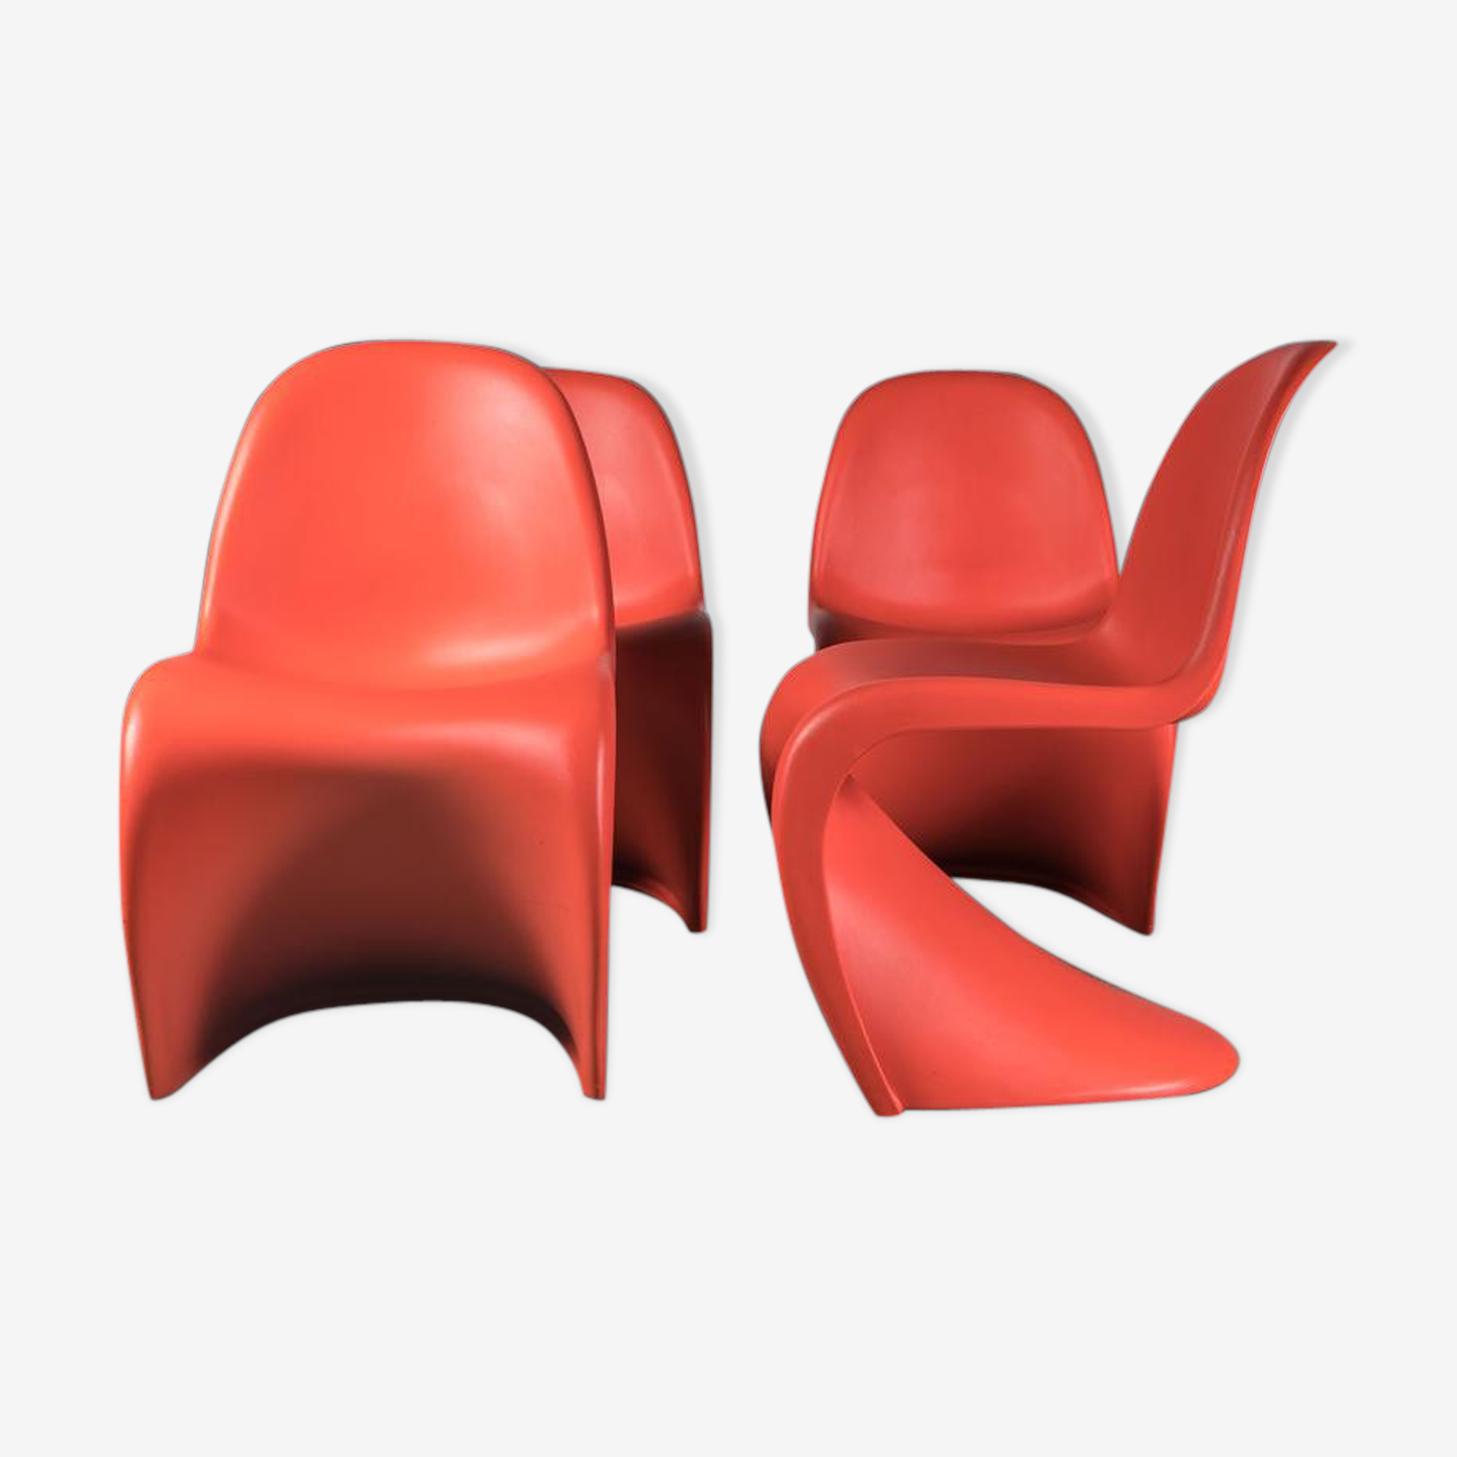 Set of 4 chairs Verner Panton S of origin